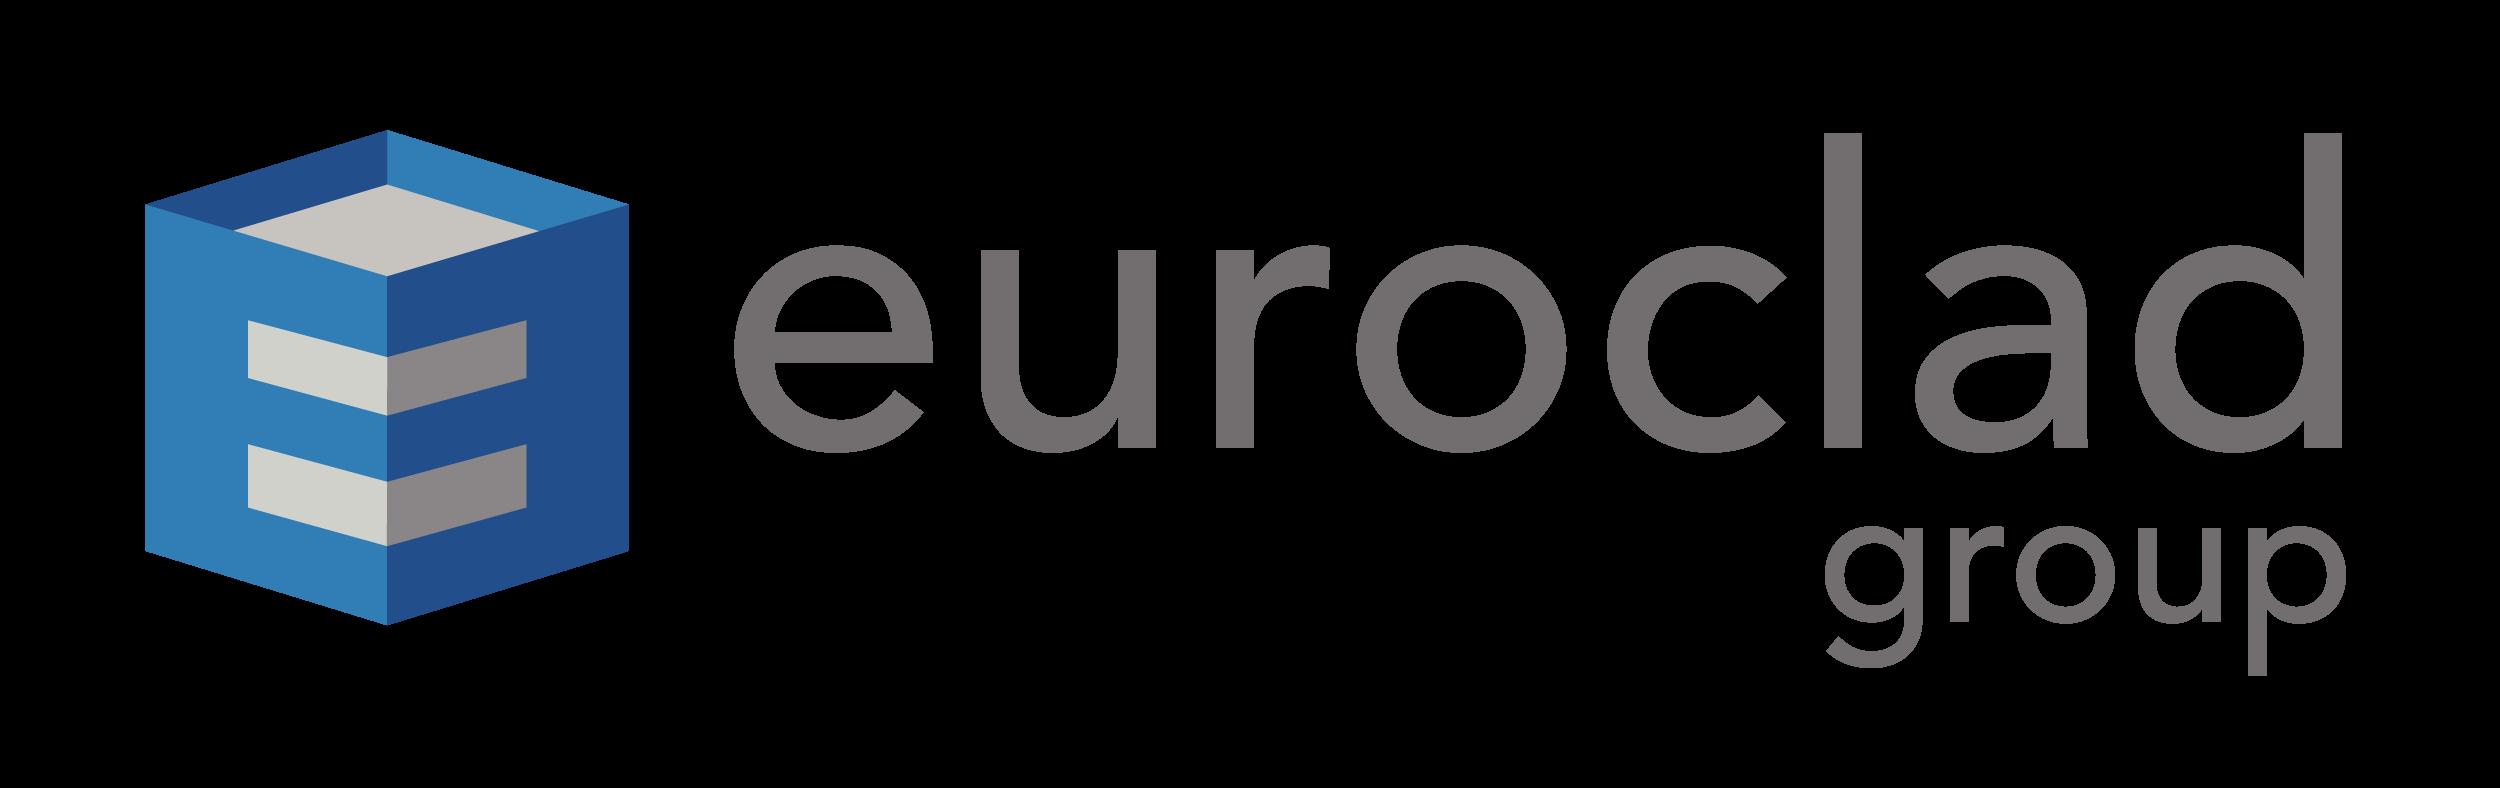 Euroclad Group Ltd Logo